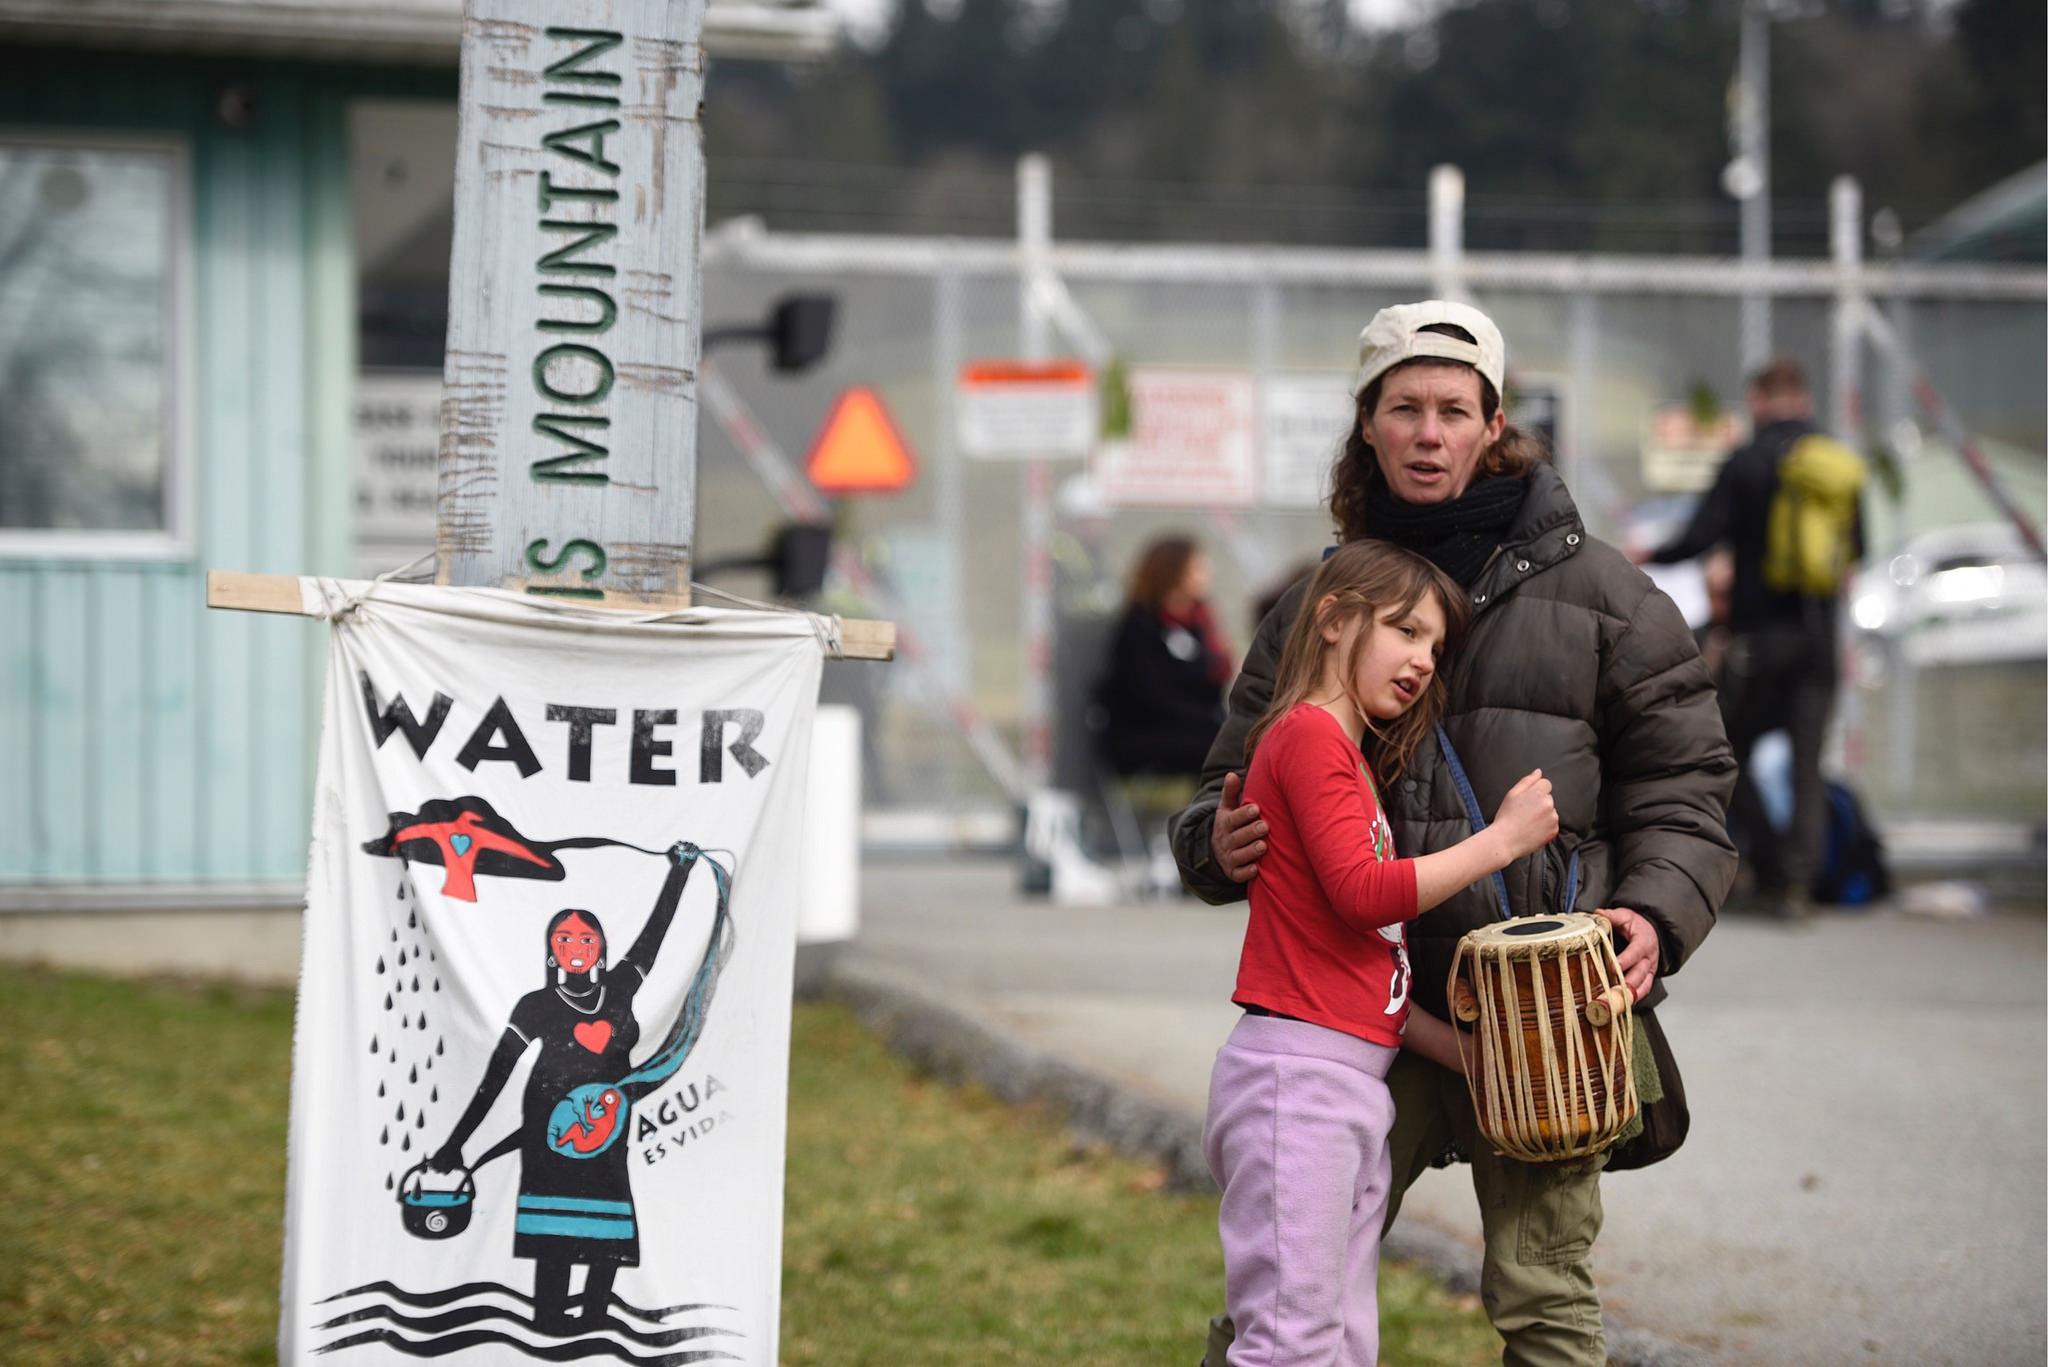 Kinder Morgan Pipeline Blockade in British Columbia, Canada on 19 March, 2018 © Rogue Collective